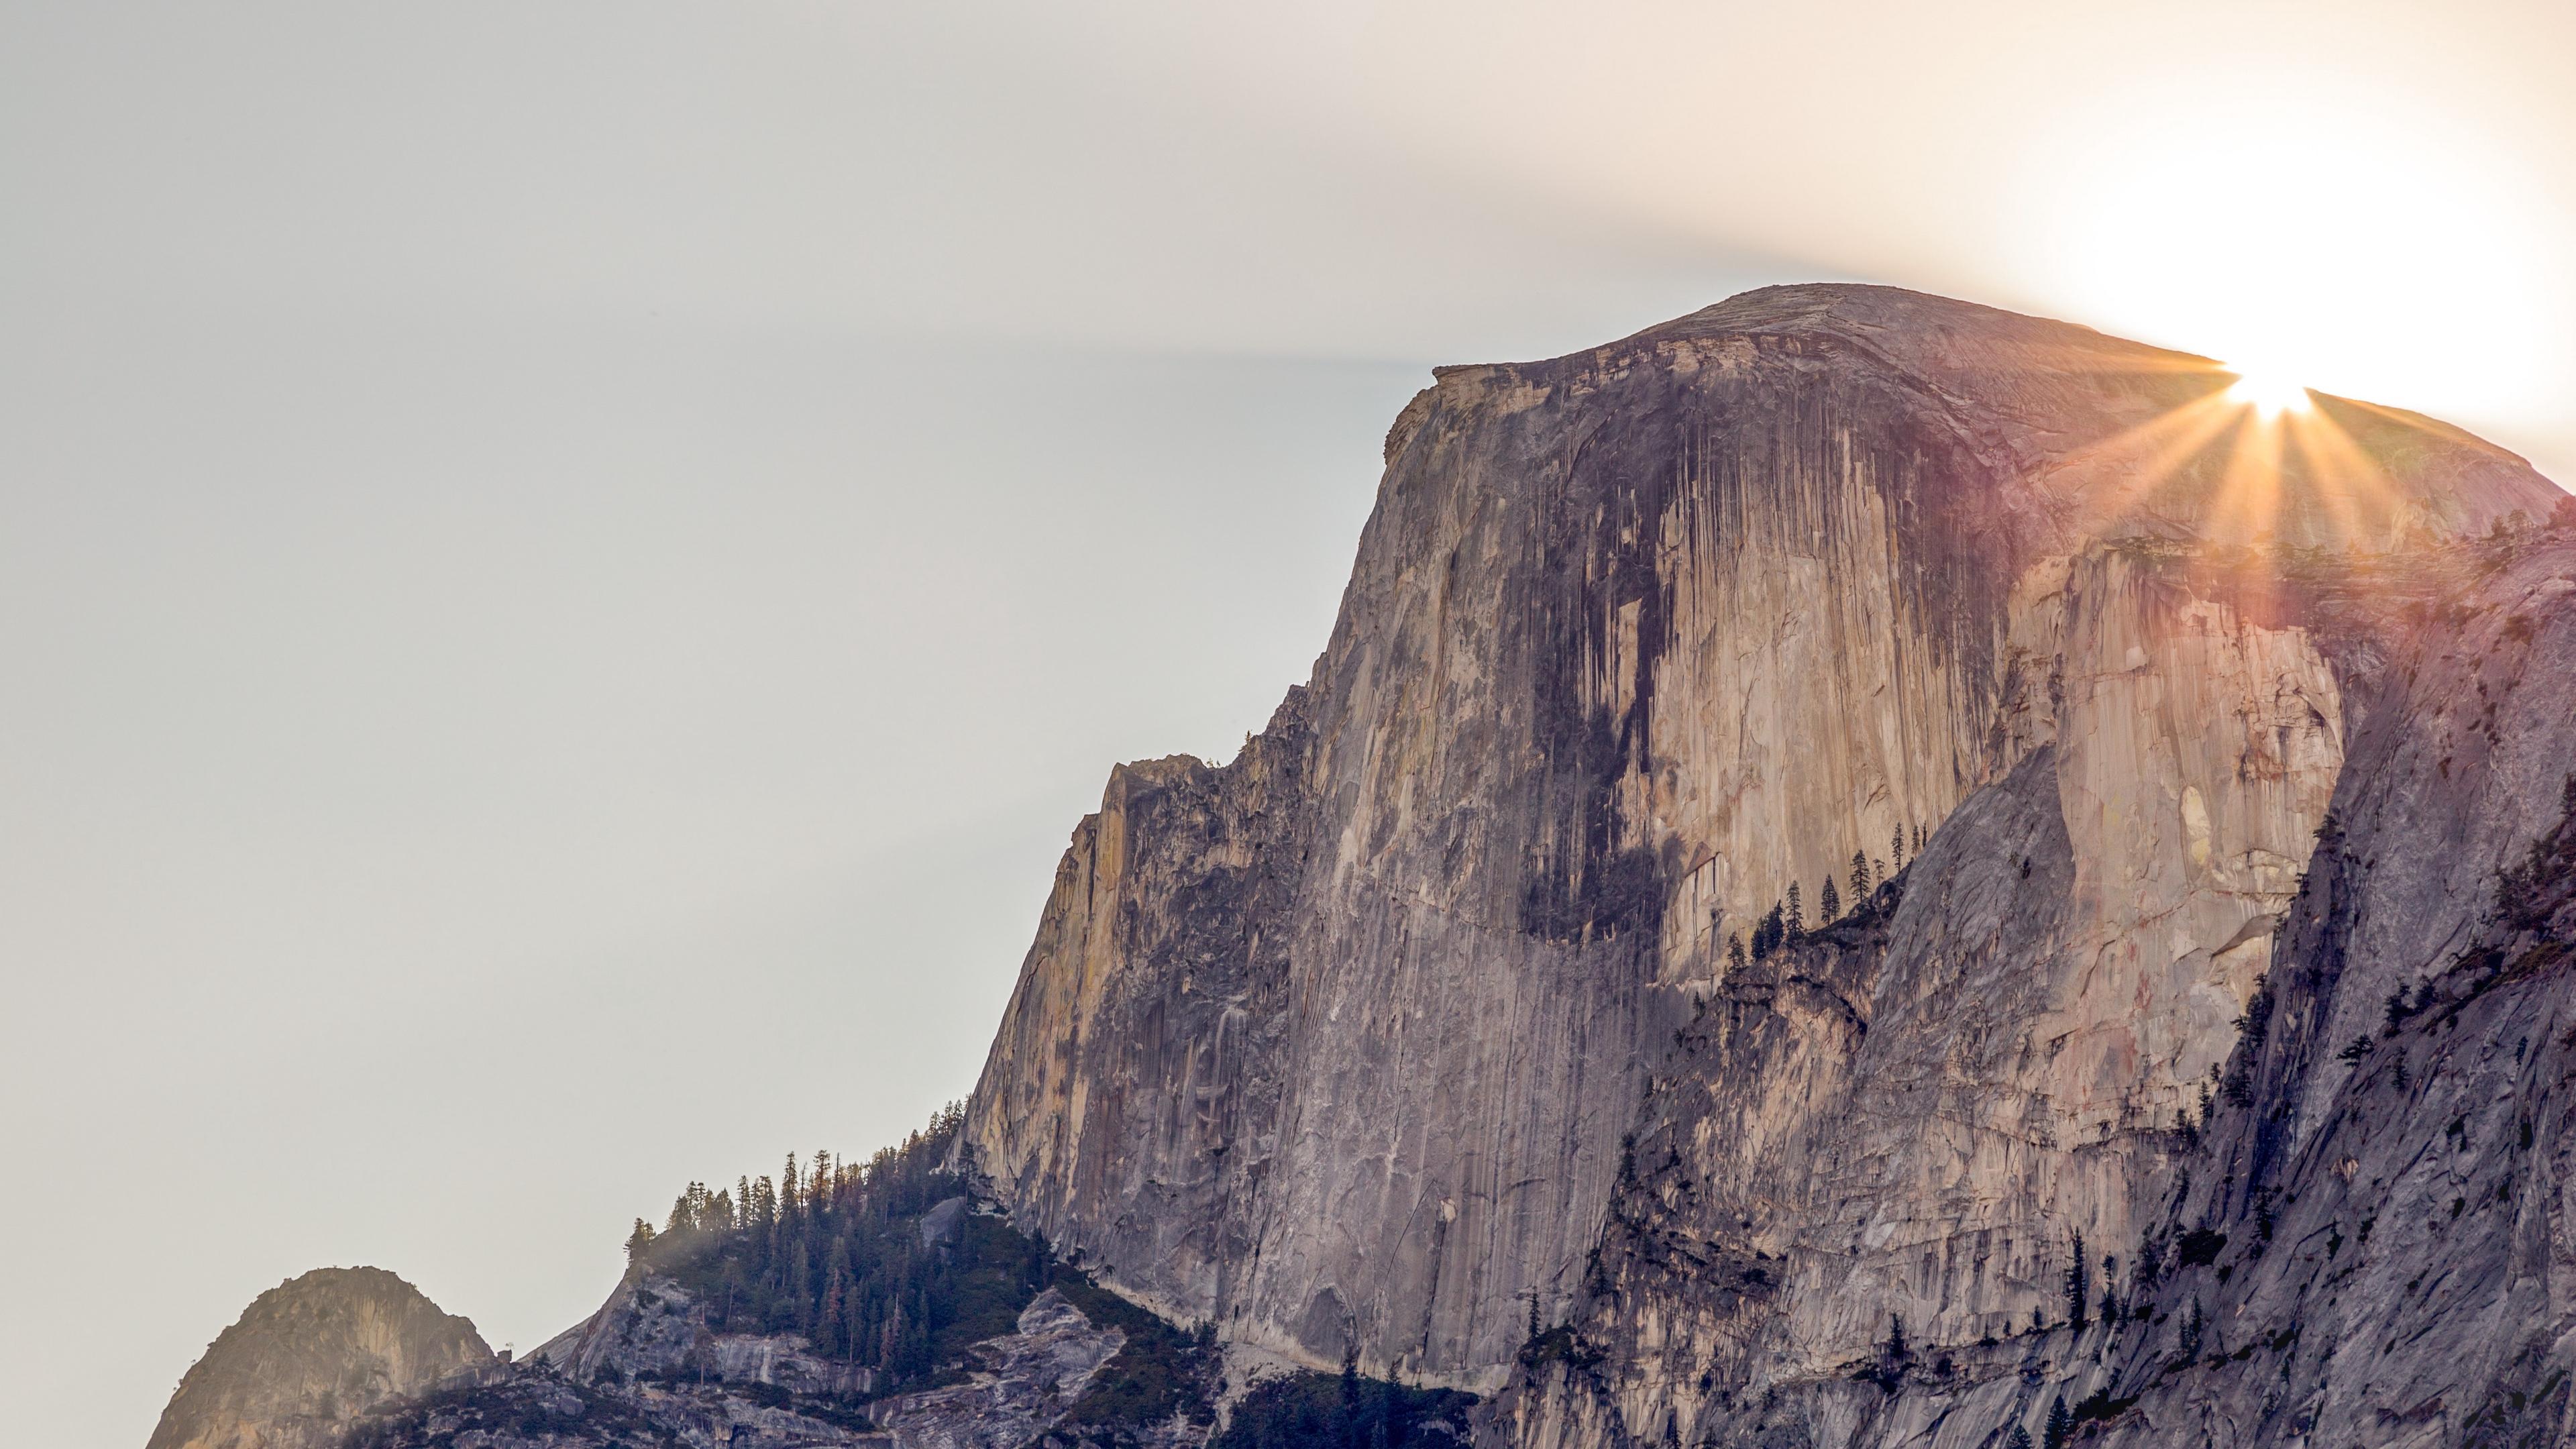 cliff mountain light sky 4k 1541116279 - cliff, mountain, light, sky 4k - Mountain, Light, Cliff